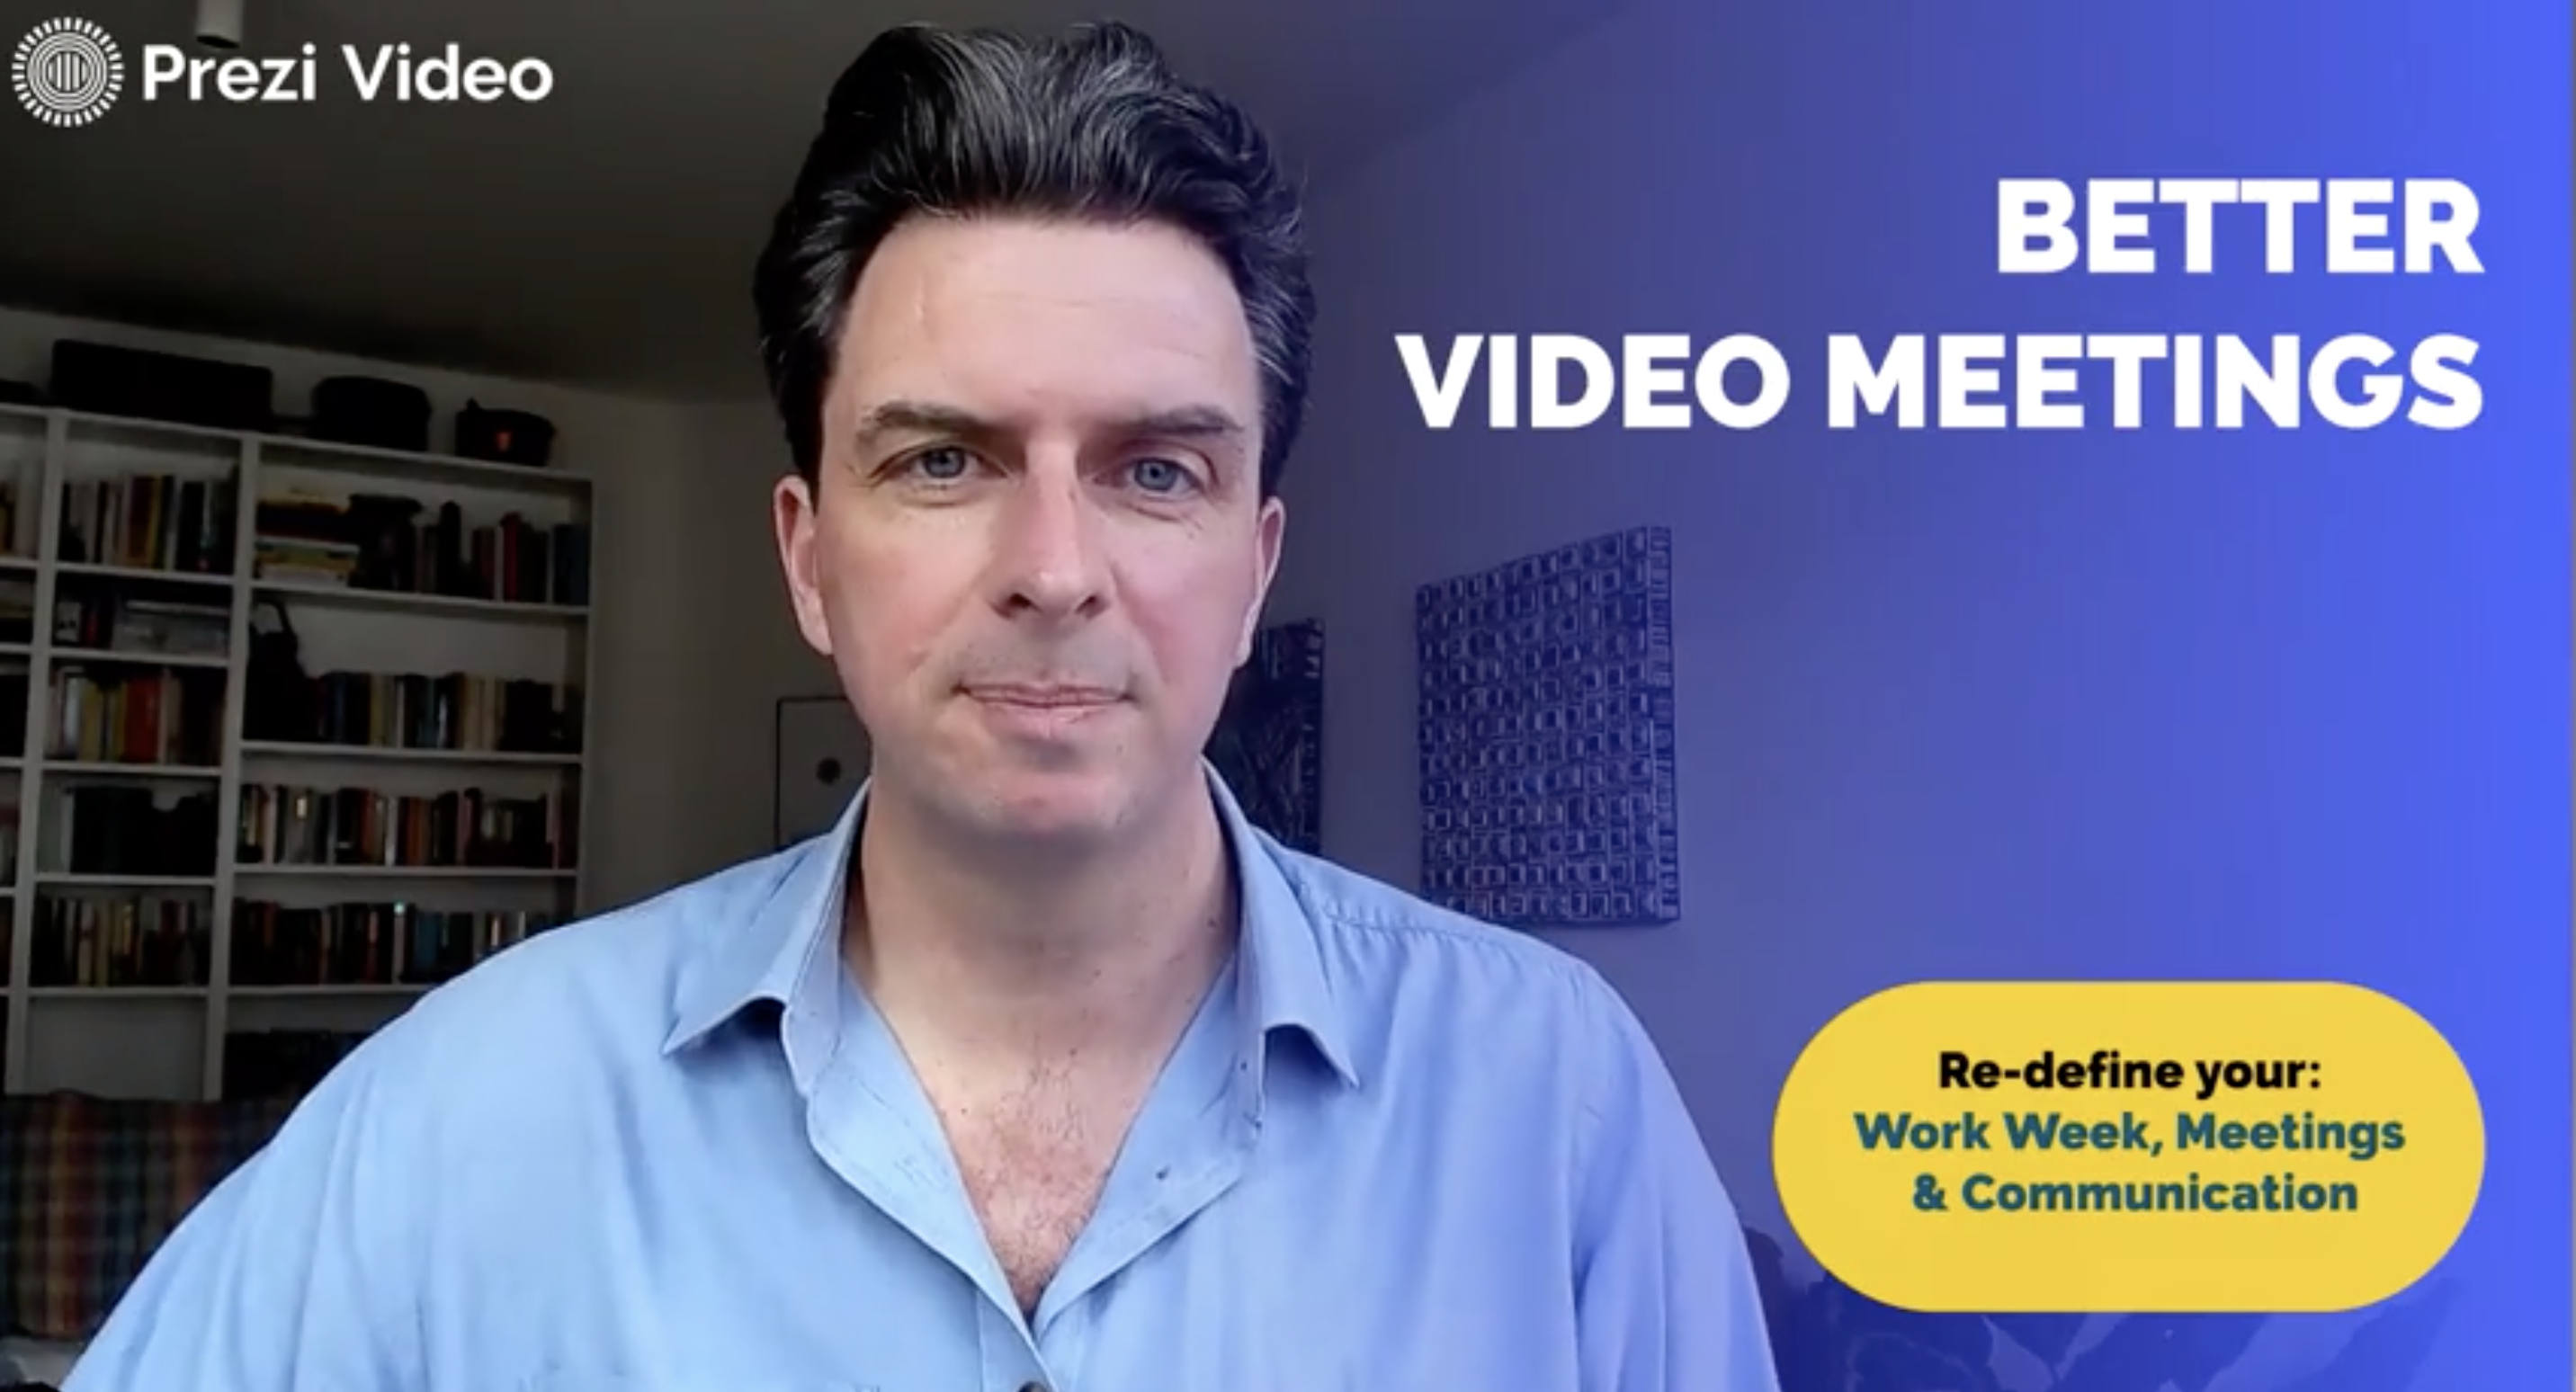 Tips for better video meetings